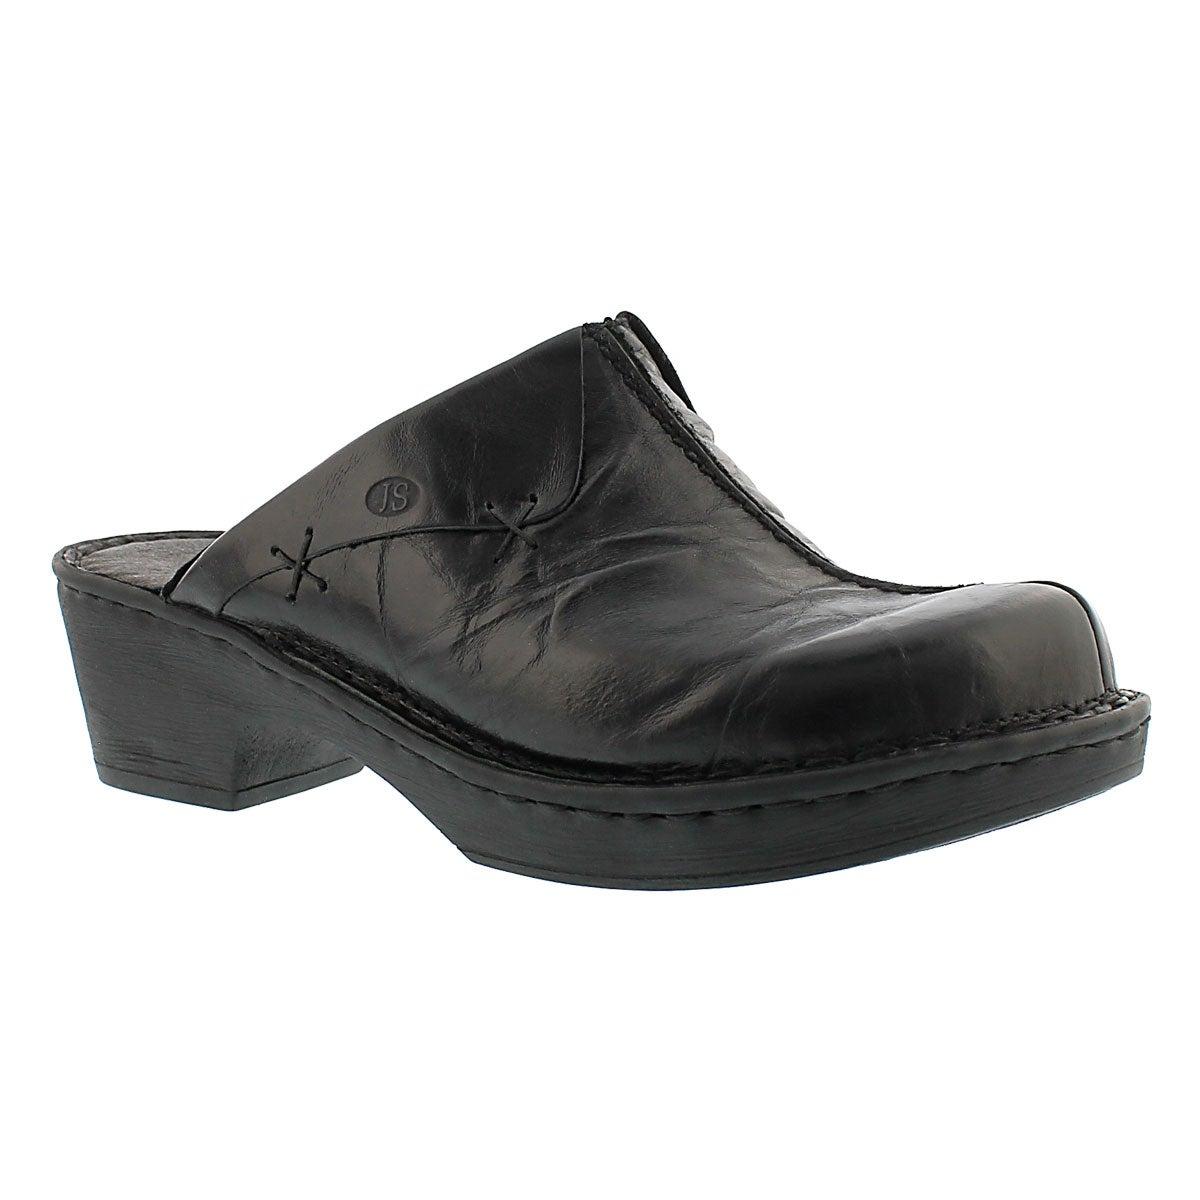 Lds Rebecca 13 black casual clog